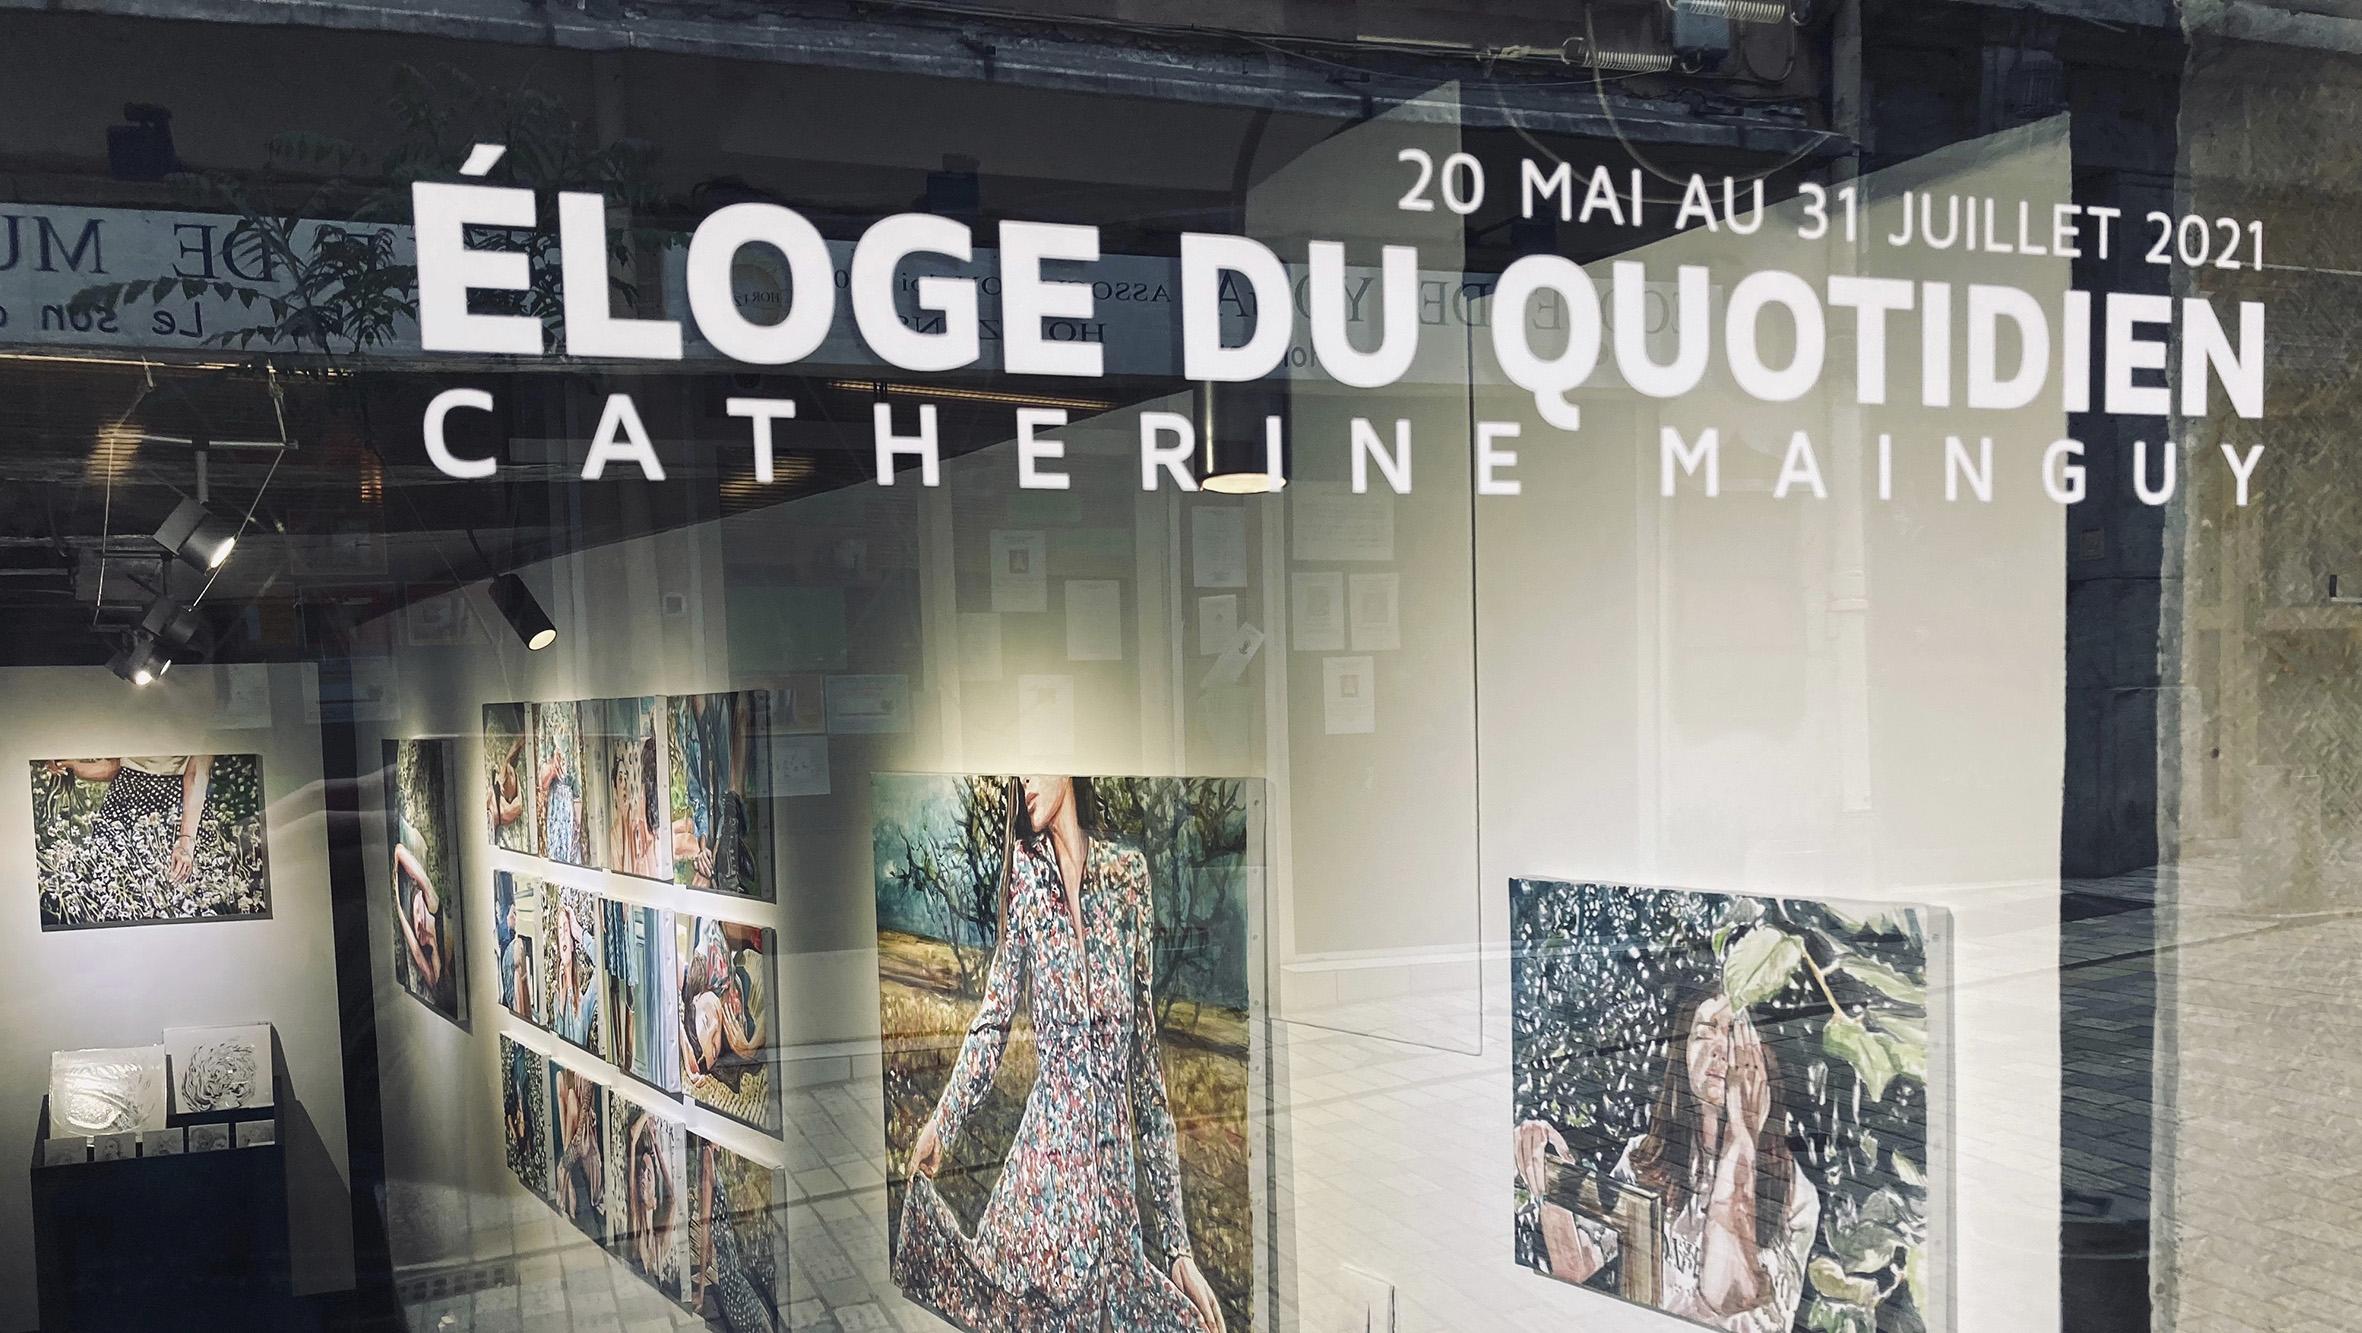 CATHERINE-MAINGUY-eloge-du-quotidien21